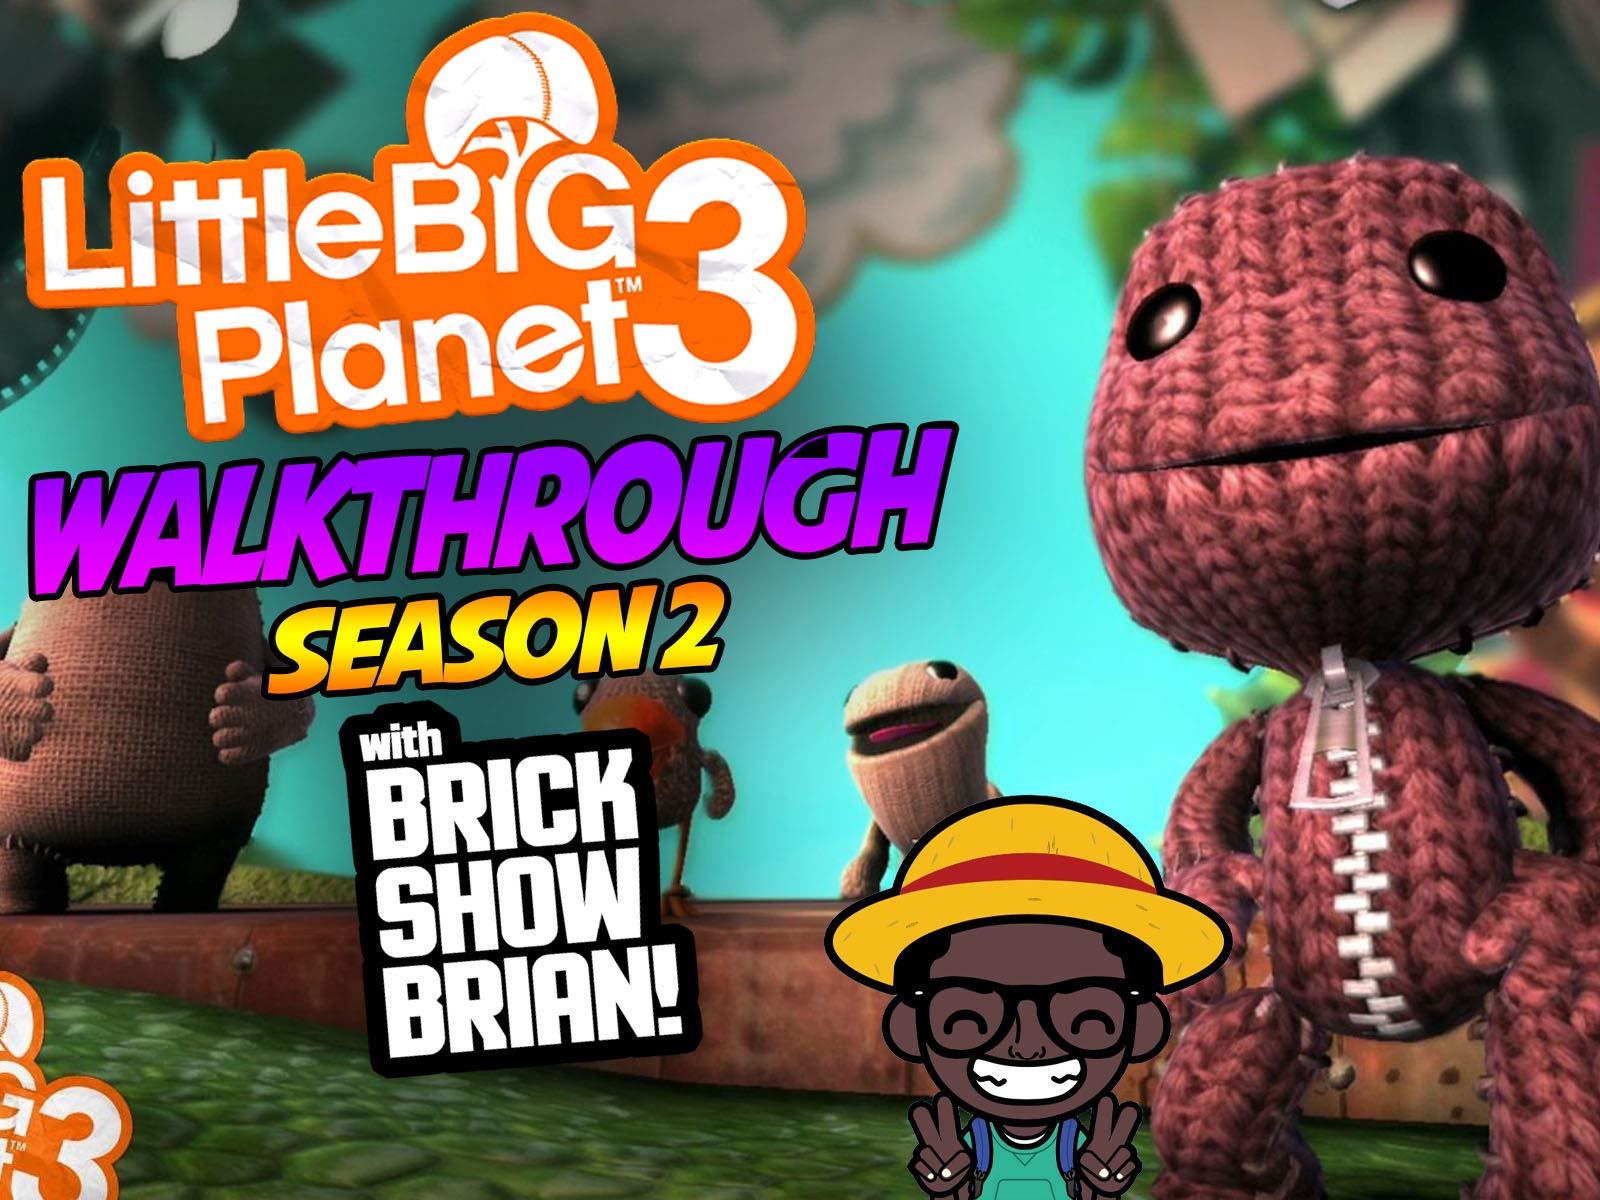 Clip: Little Big Planet 3 Walkthrough With Brick Show Brian - Season 2